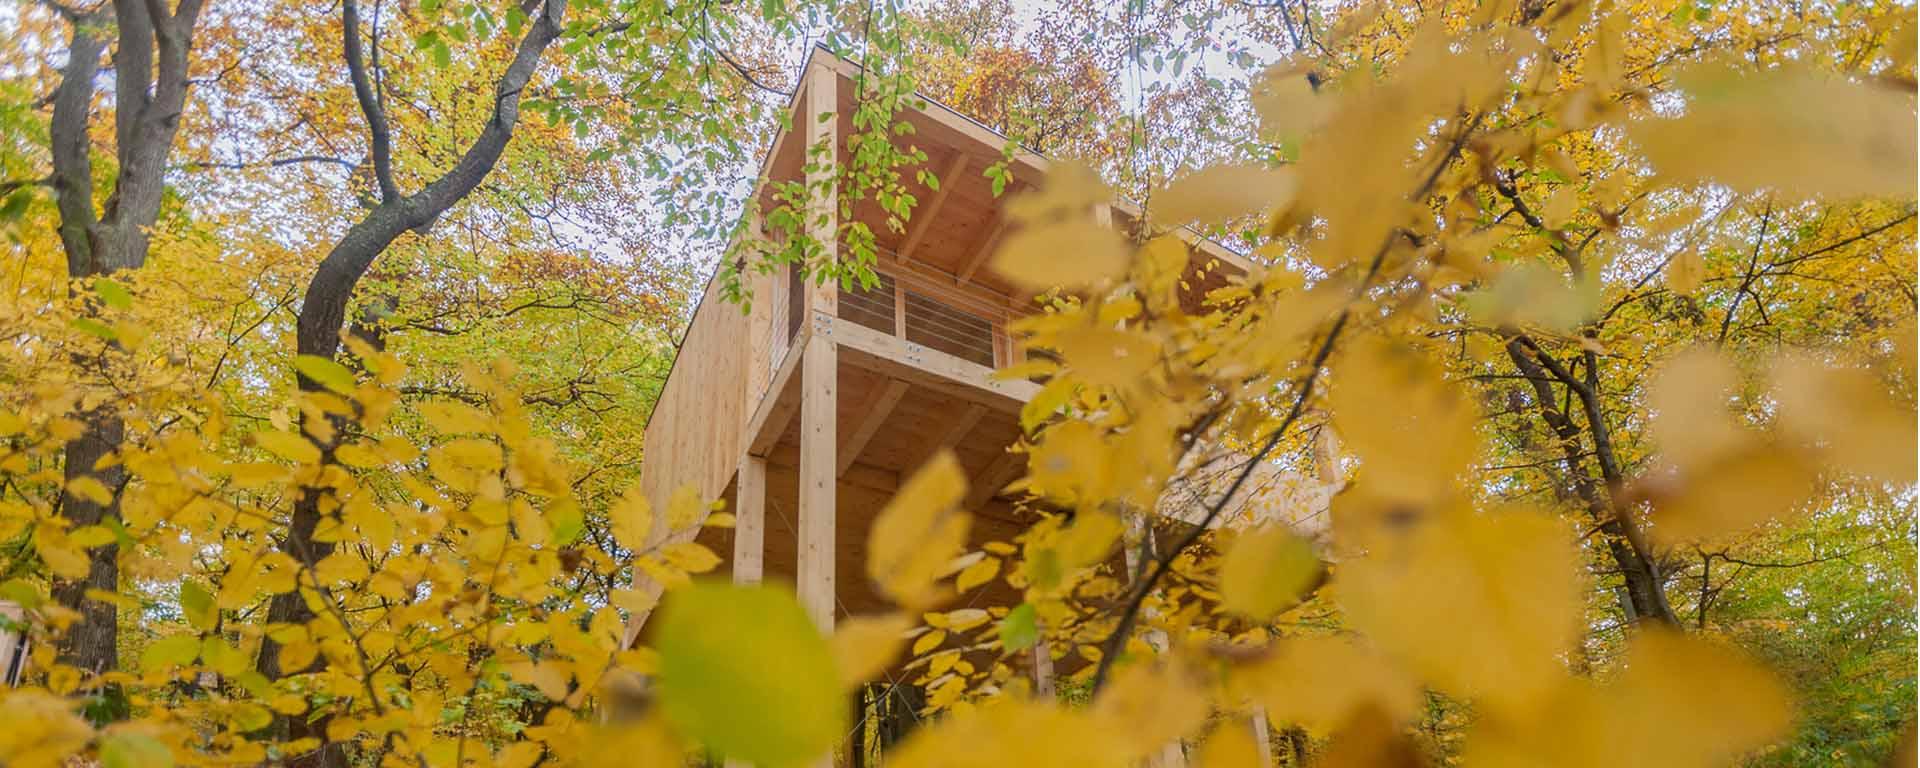 treehouses-noszvaj-lombhazak-fo-kep03